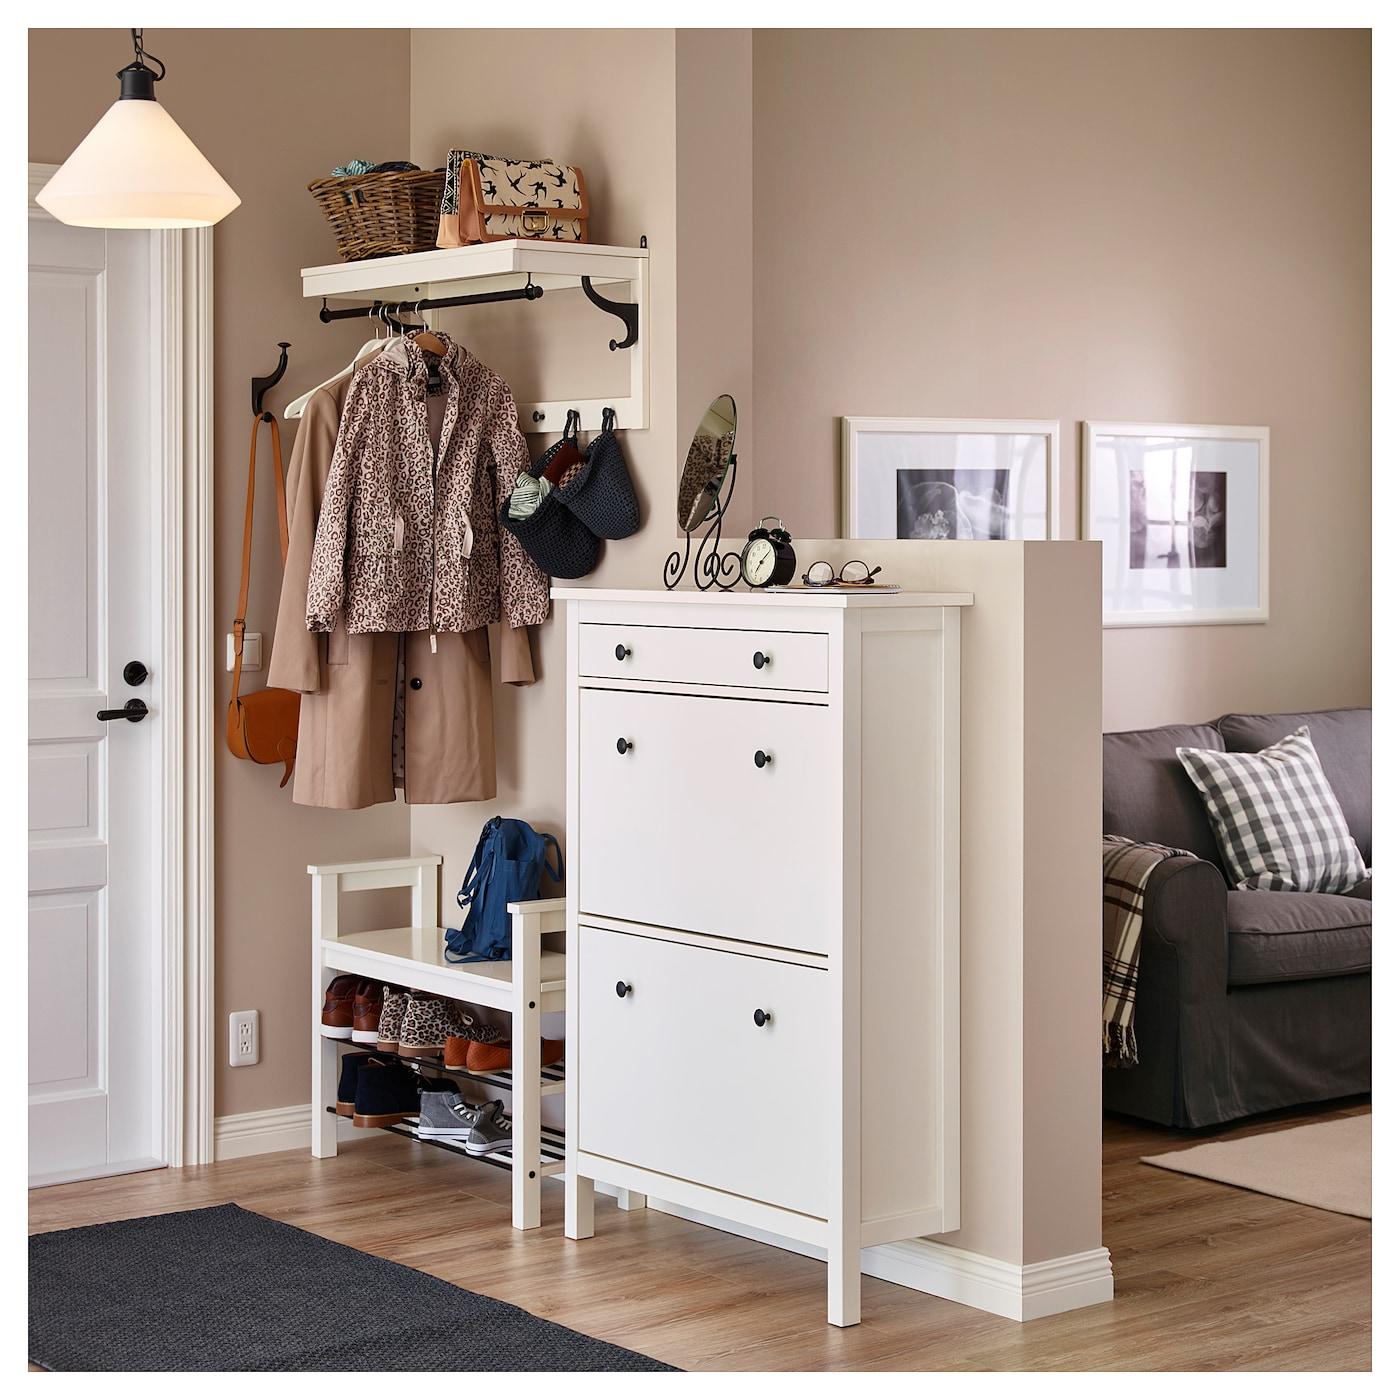 shoes cabinets furniture. IKEA HEMNES Shoe Cabinet With 2 Compartments Shoes Cabinets Furniture M